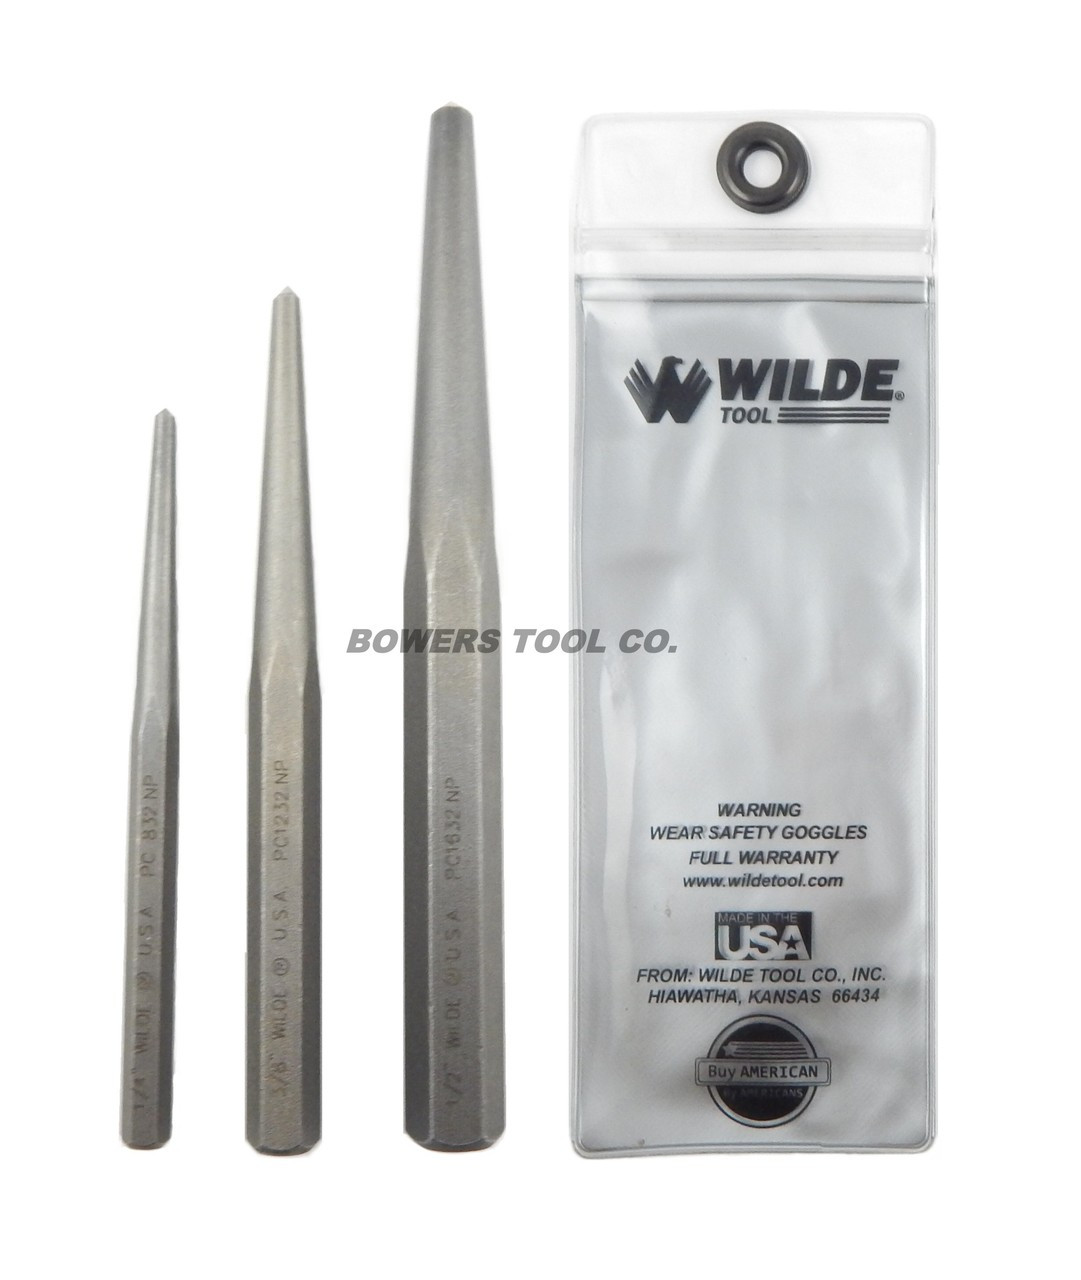 Wilde Tool RH1232-9 Rolling Head Pry Bar 9